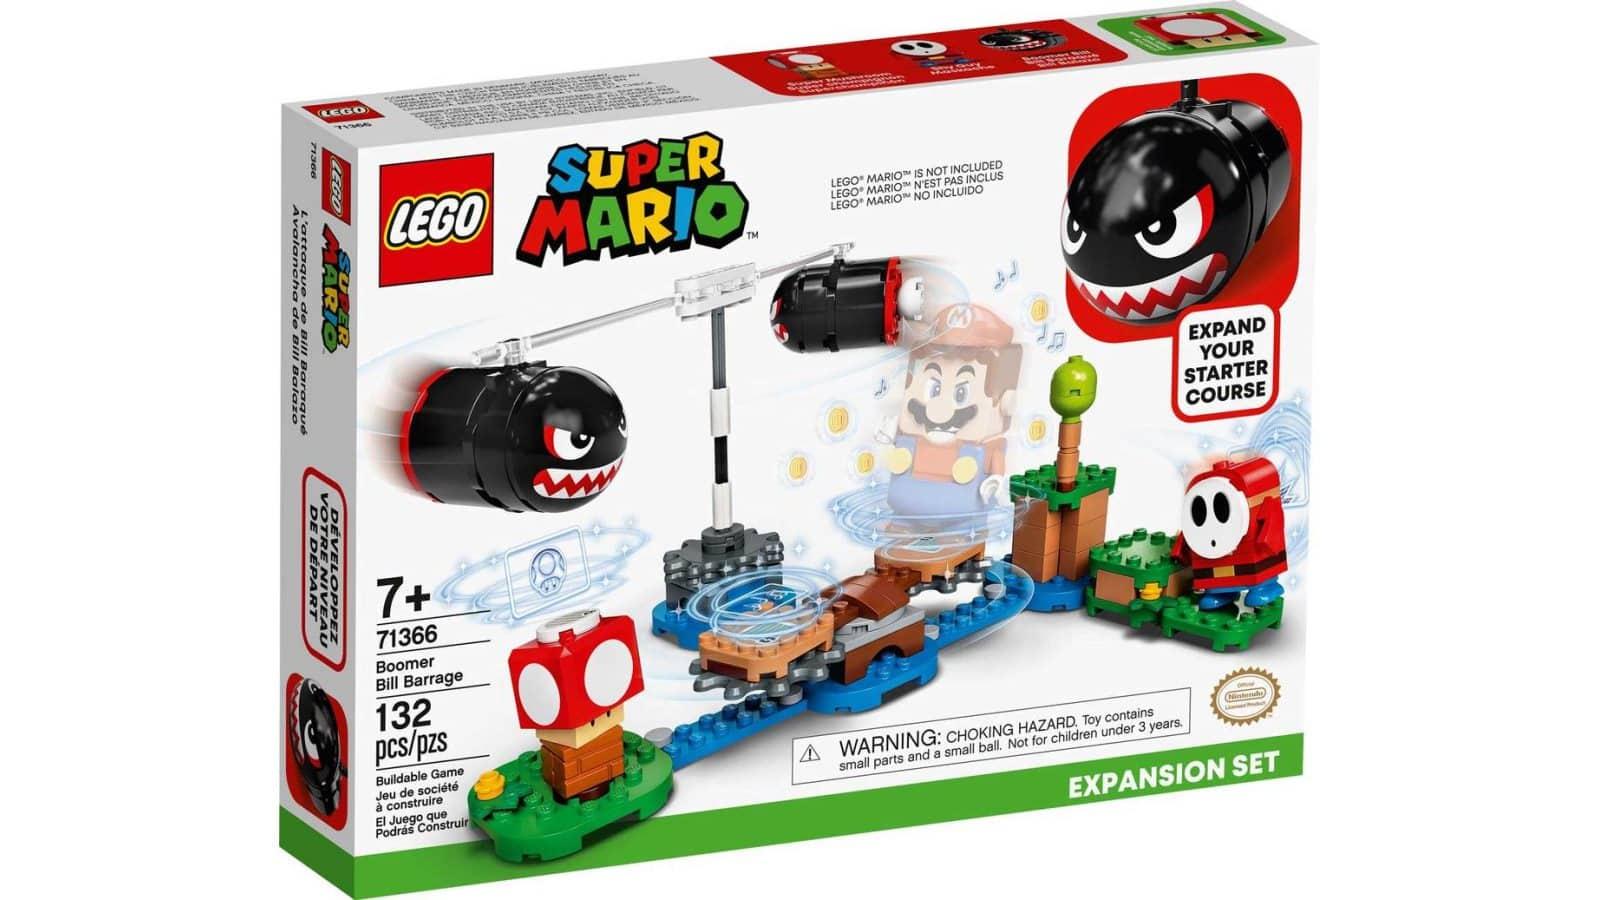 LEGO 71366 Boomer Bill Barrage Expansion Set - אריזה